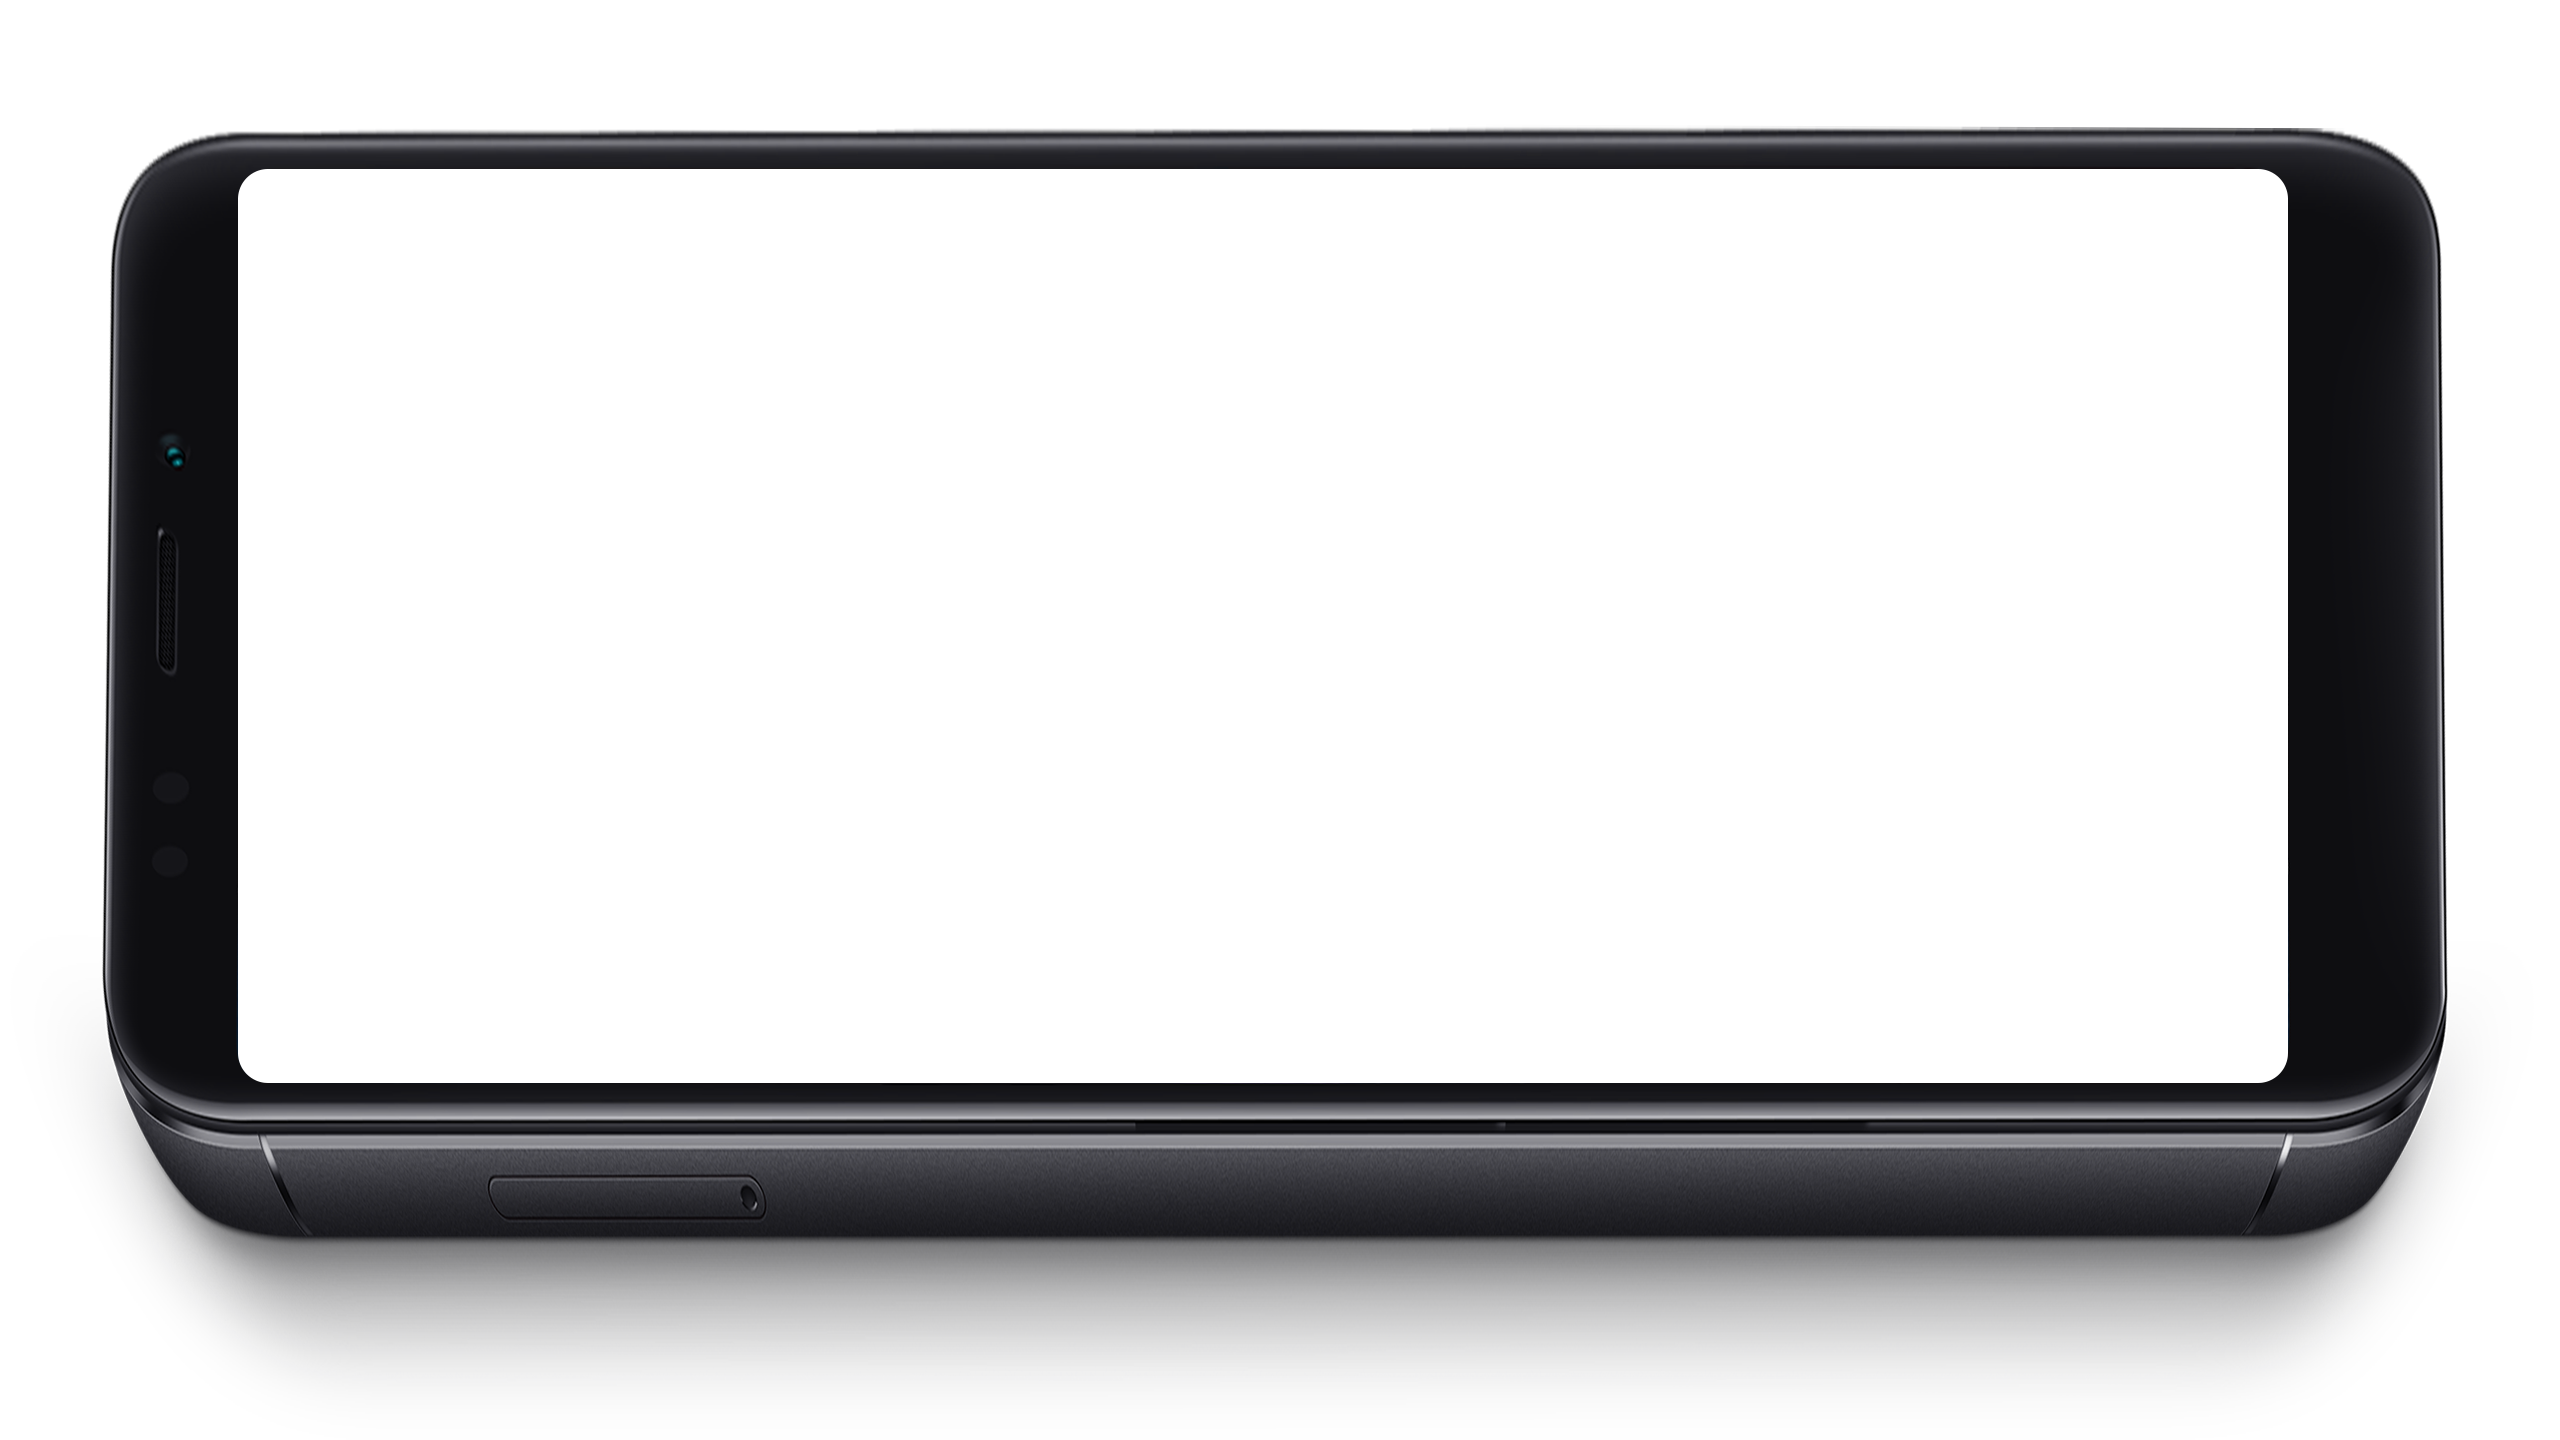 Redmi Note 5 Full Screen Display Mi India